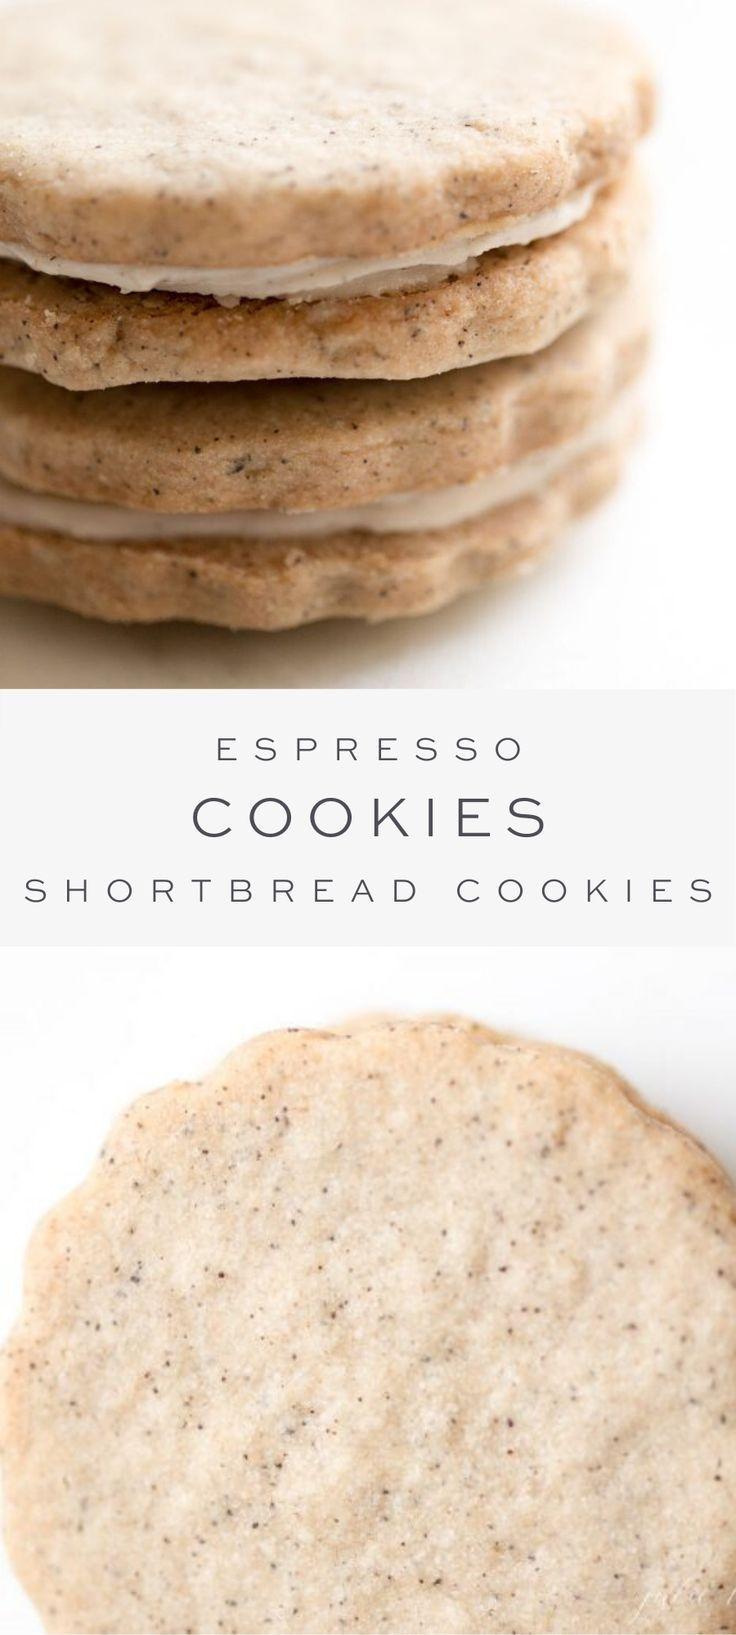 Espresso Cookies | Latte Cookies Recipe